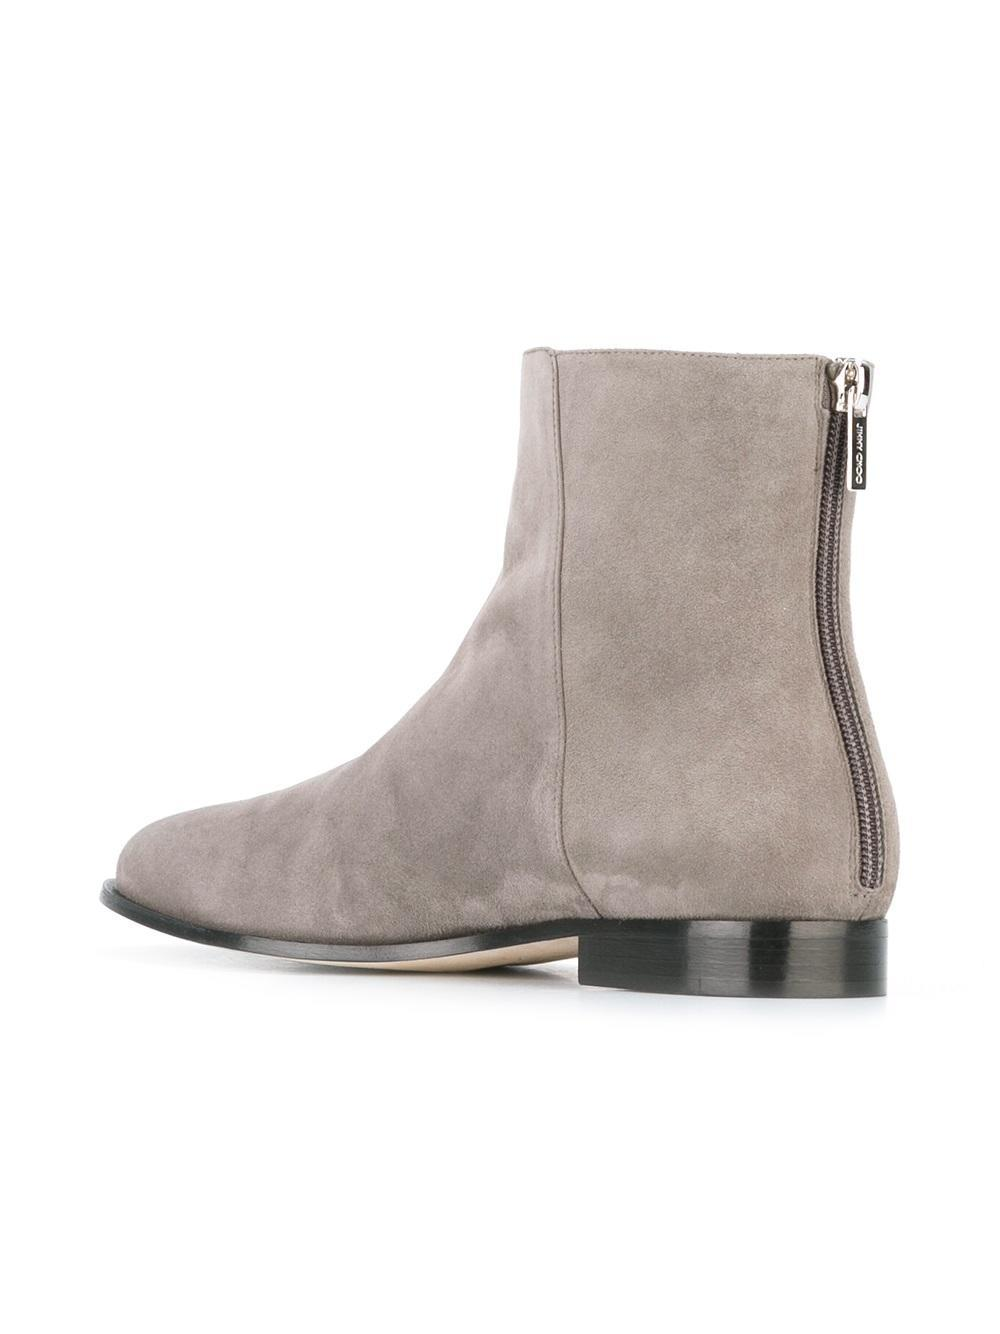 newest ef3d0 600a0 jimmy-choo-Grey-Duke-Ankle-Boots.jpeg